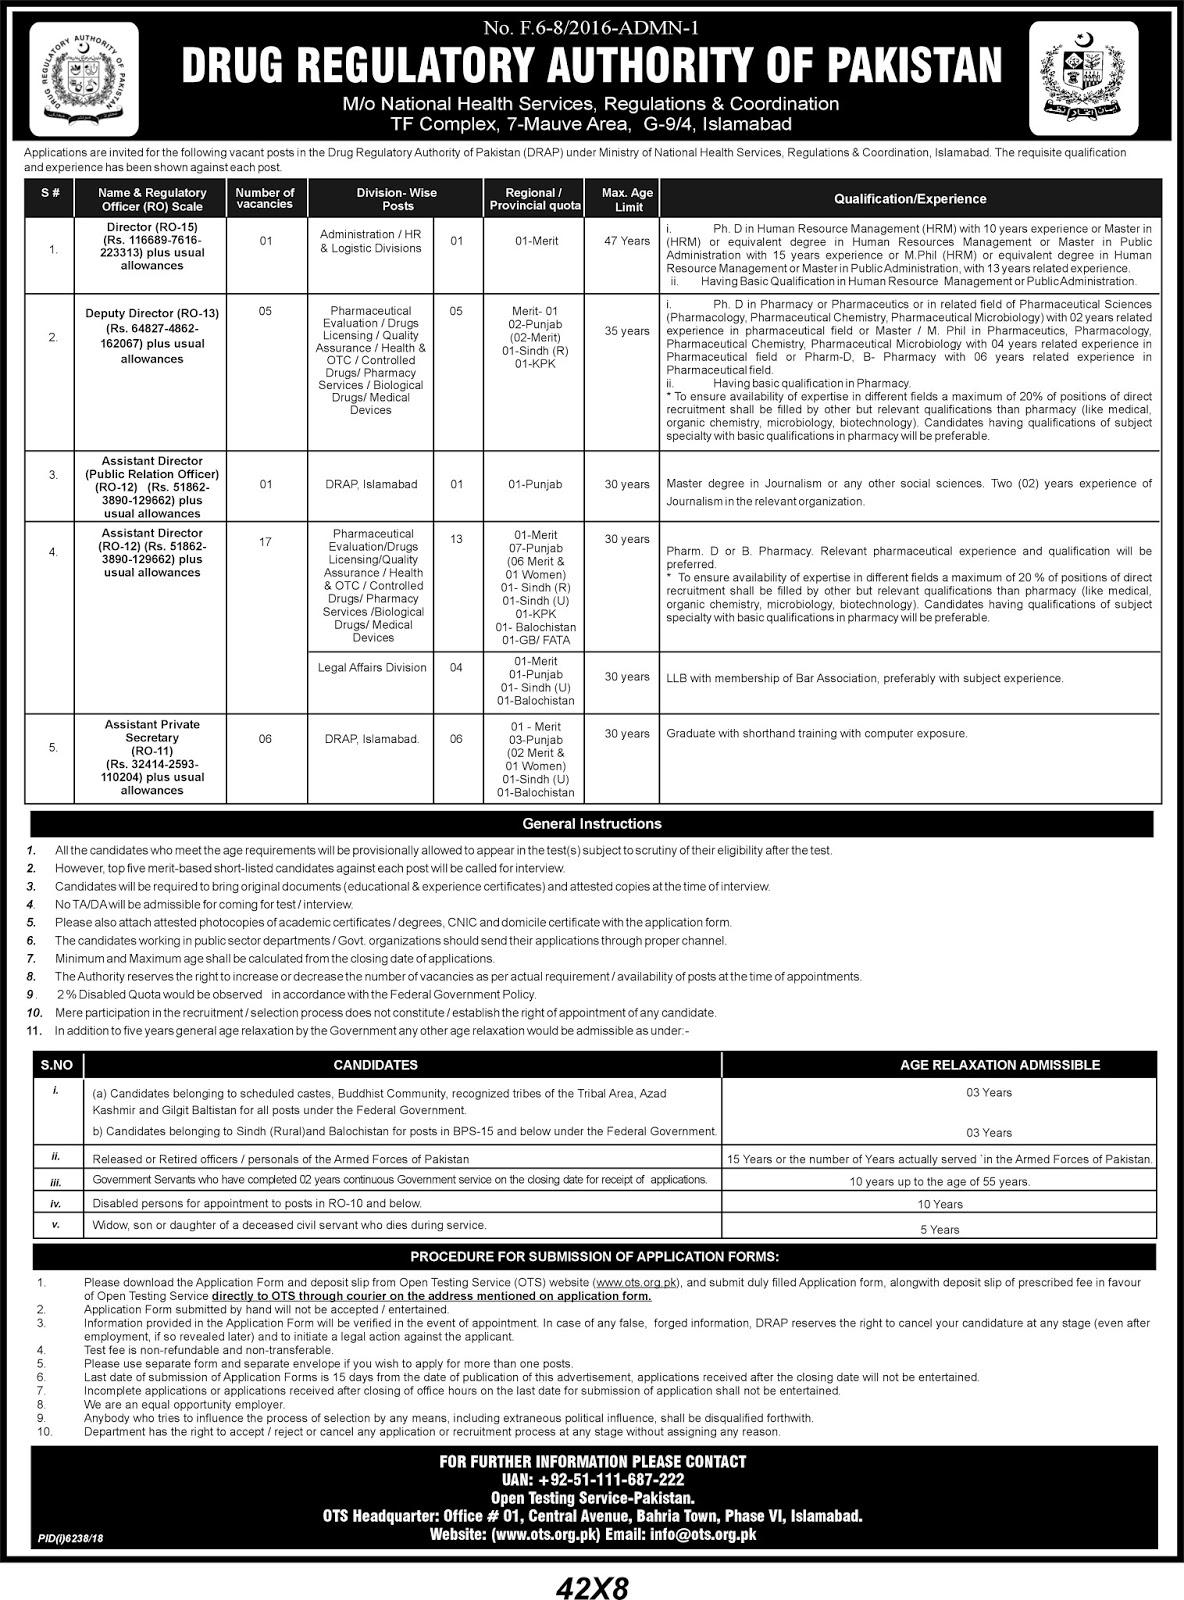 Drug Regulatory Authority of Pakistan Jobs 2019 July via OTS